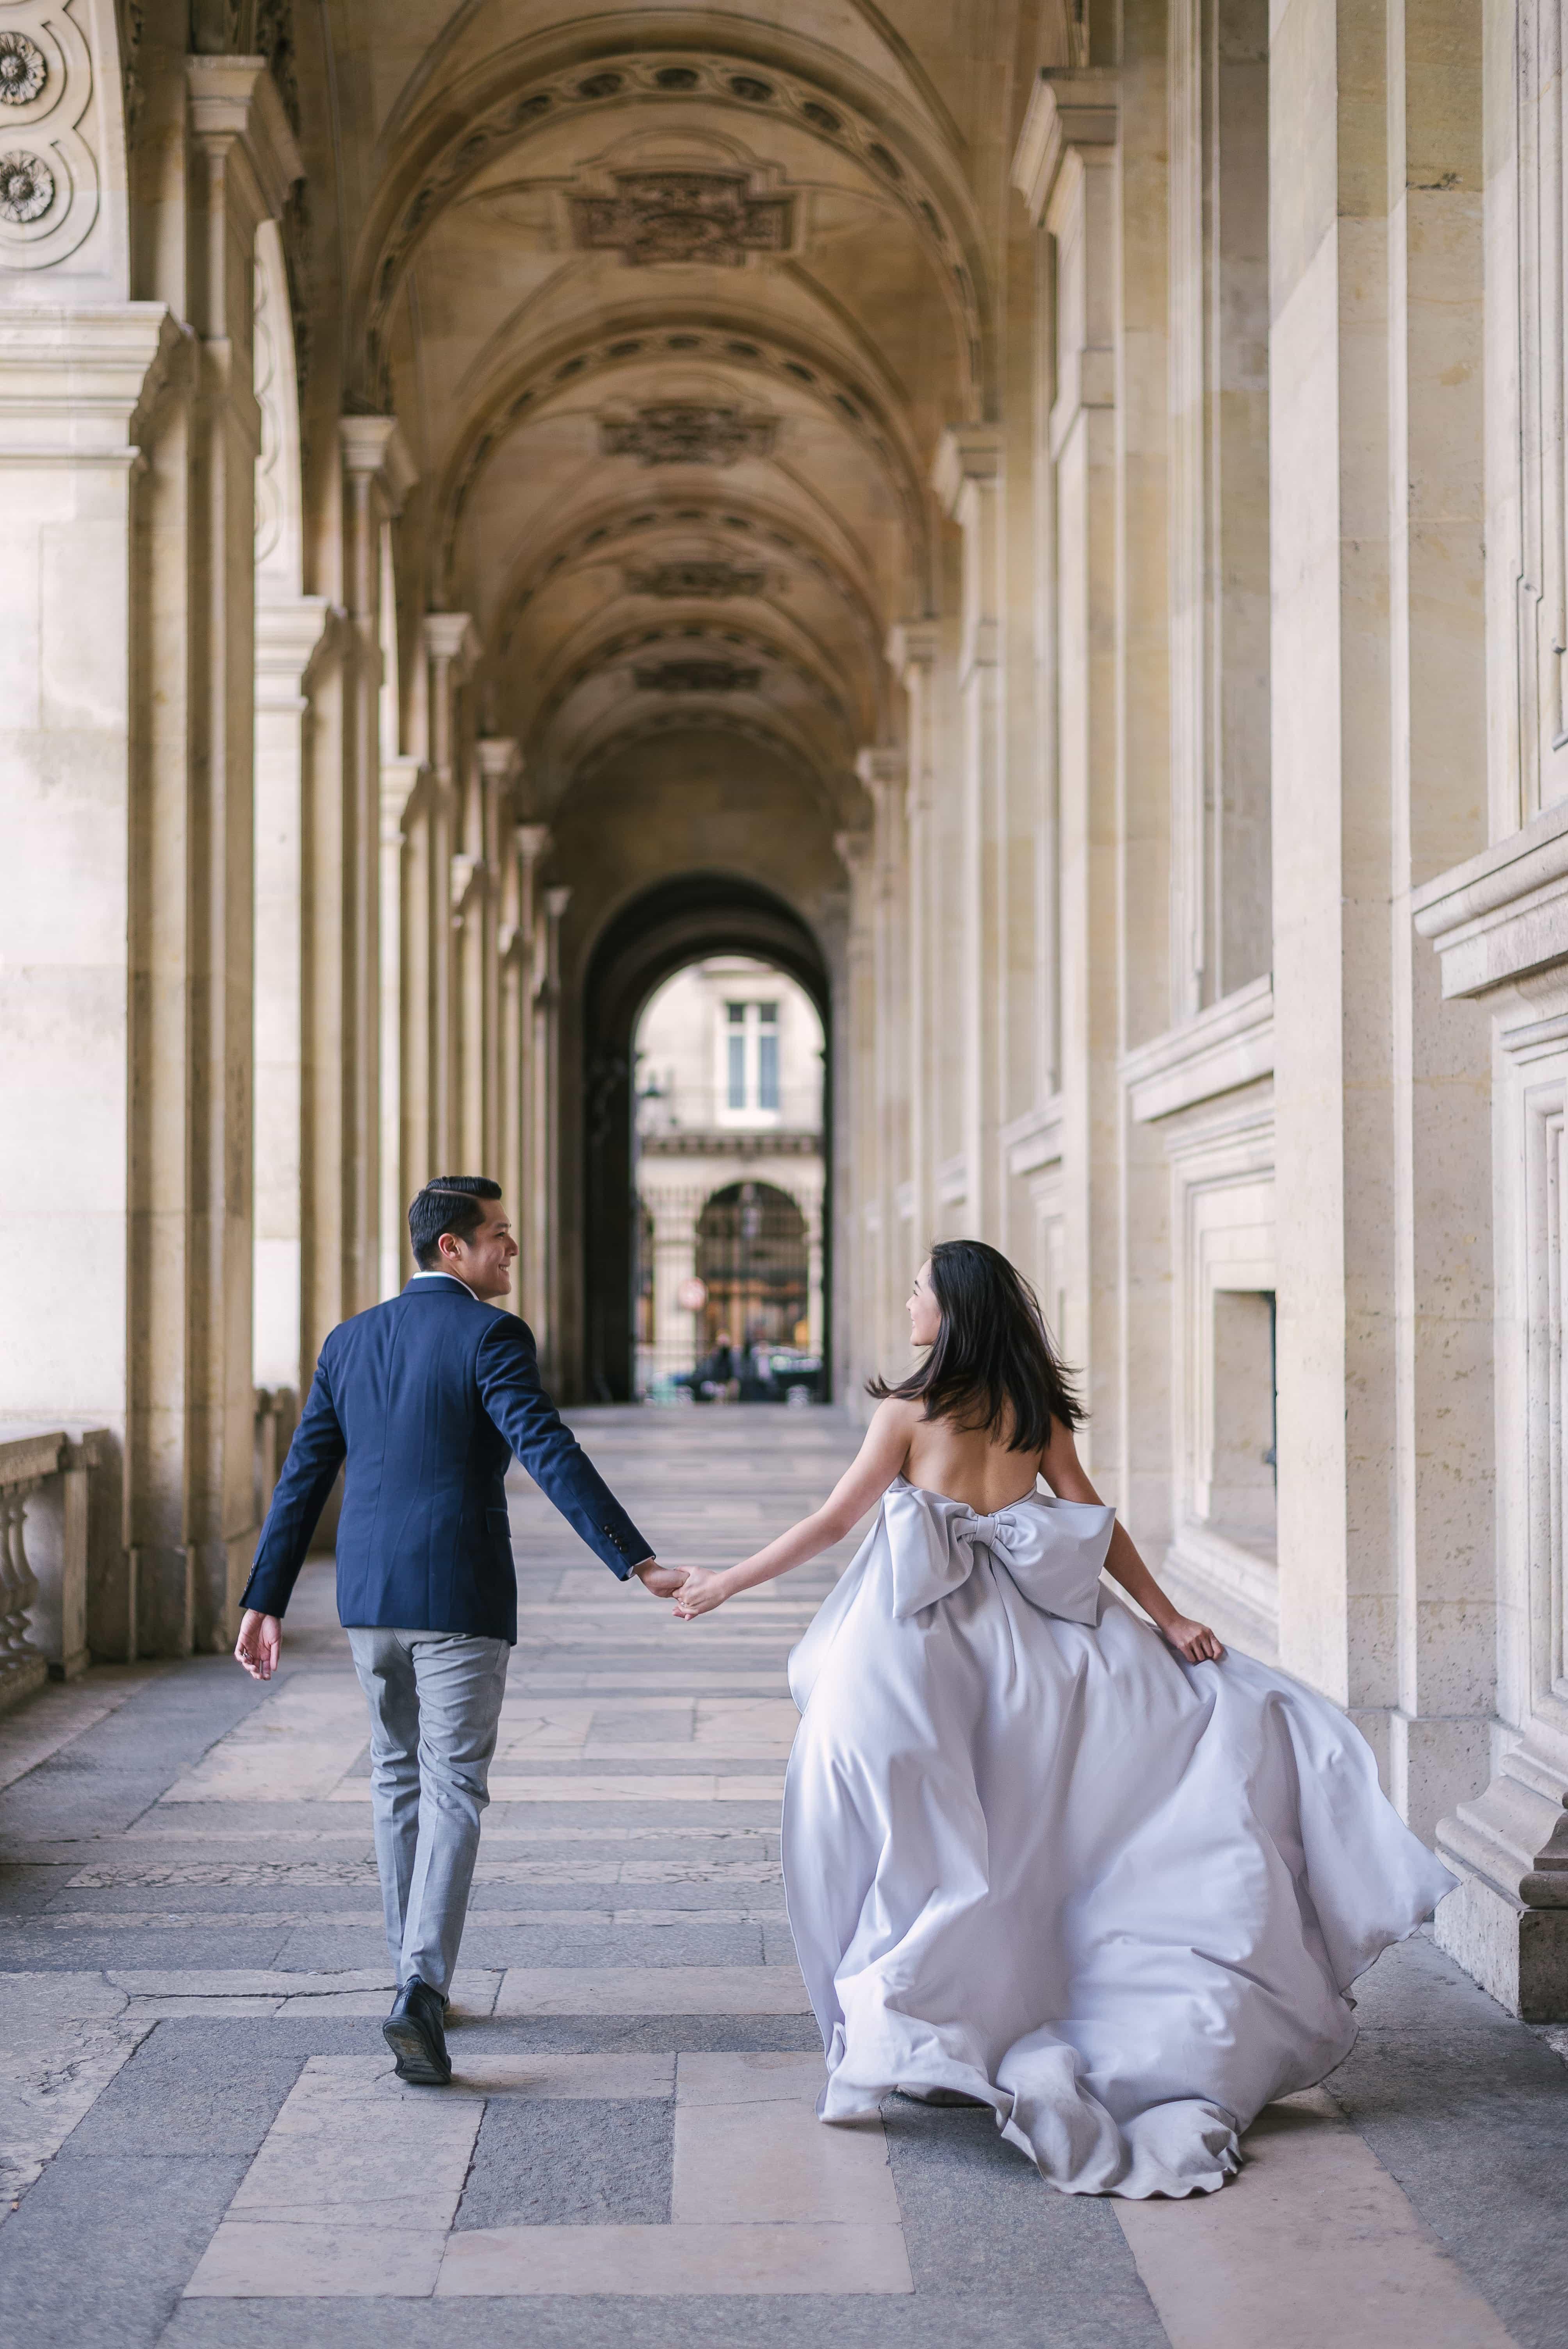 best places to take photos in paris – louvre museum elegant arches